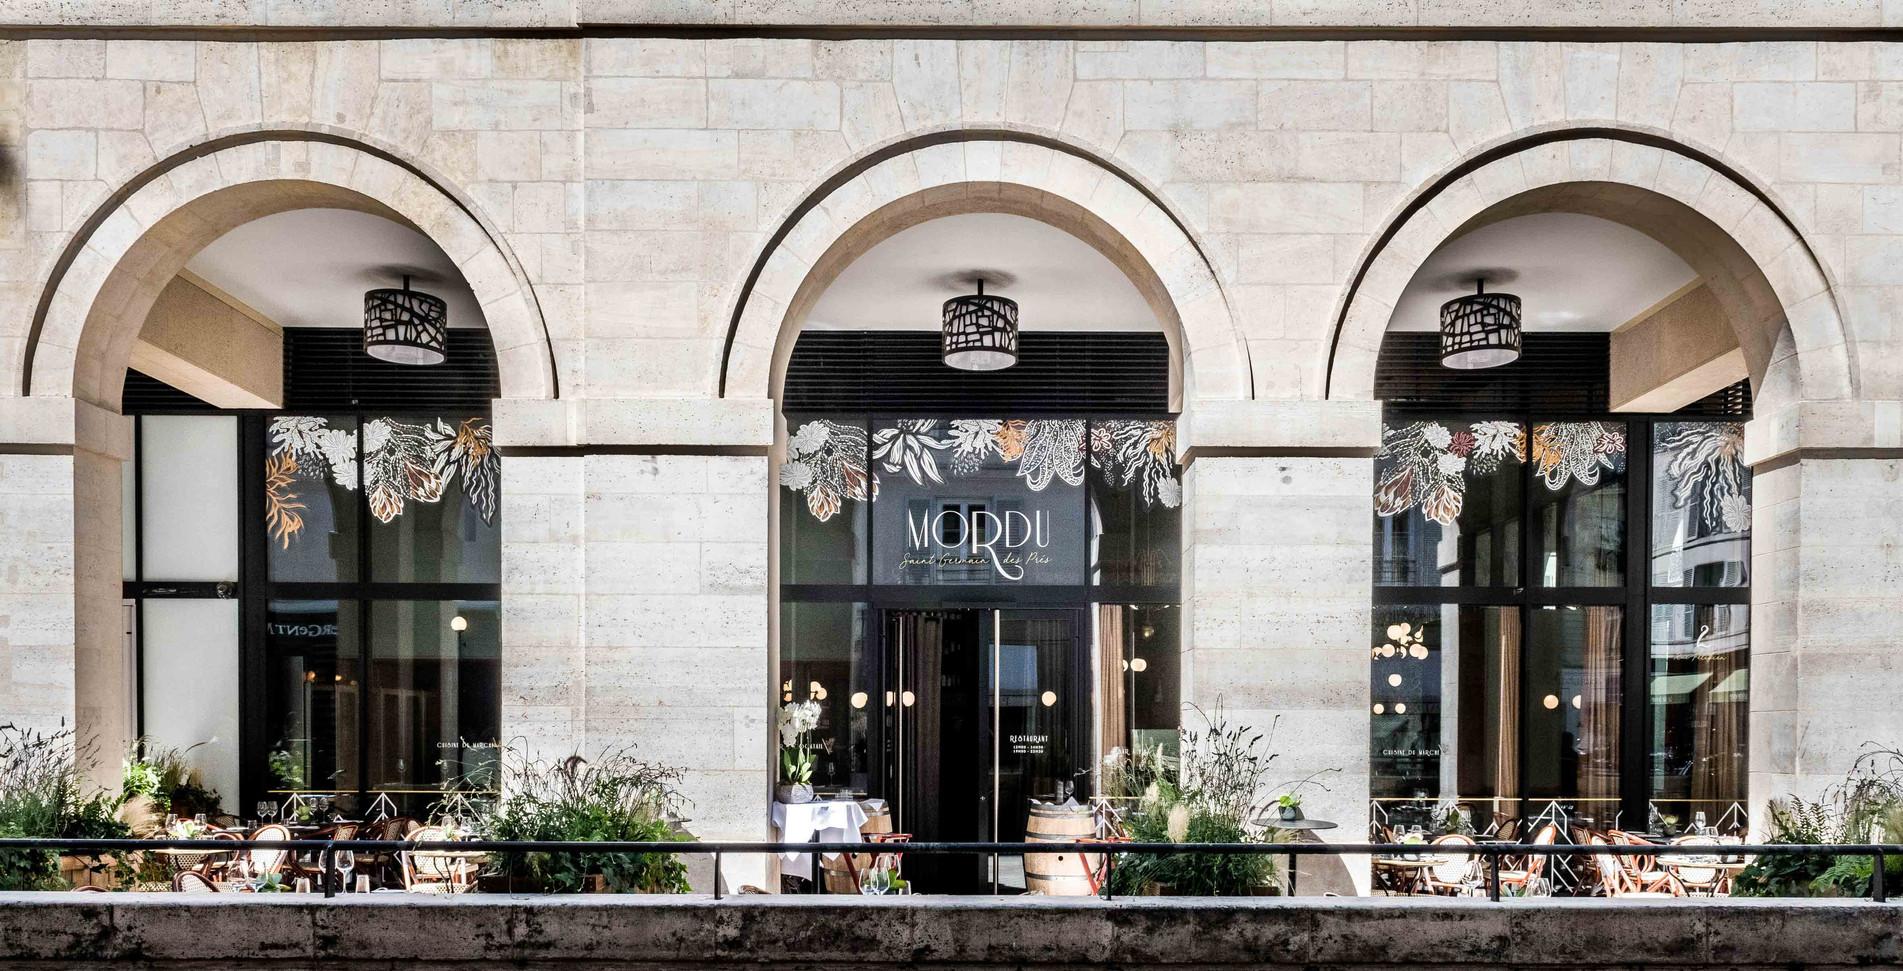 MORDU_Paris_Restaurant_facade.jpg